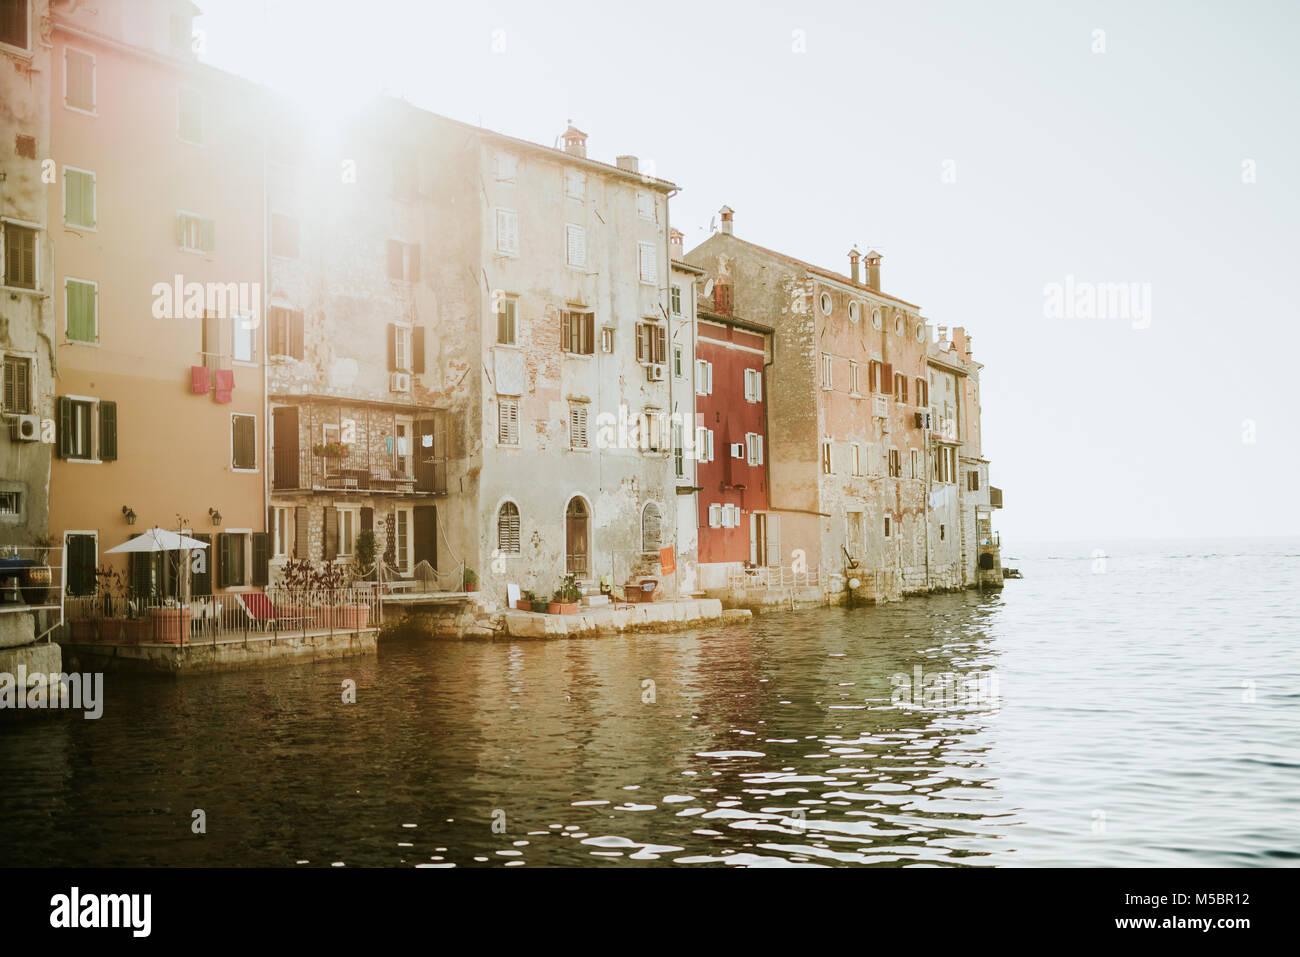 Beautiful City of Rovinj in Croatia - Stock Image